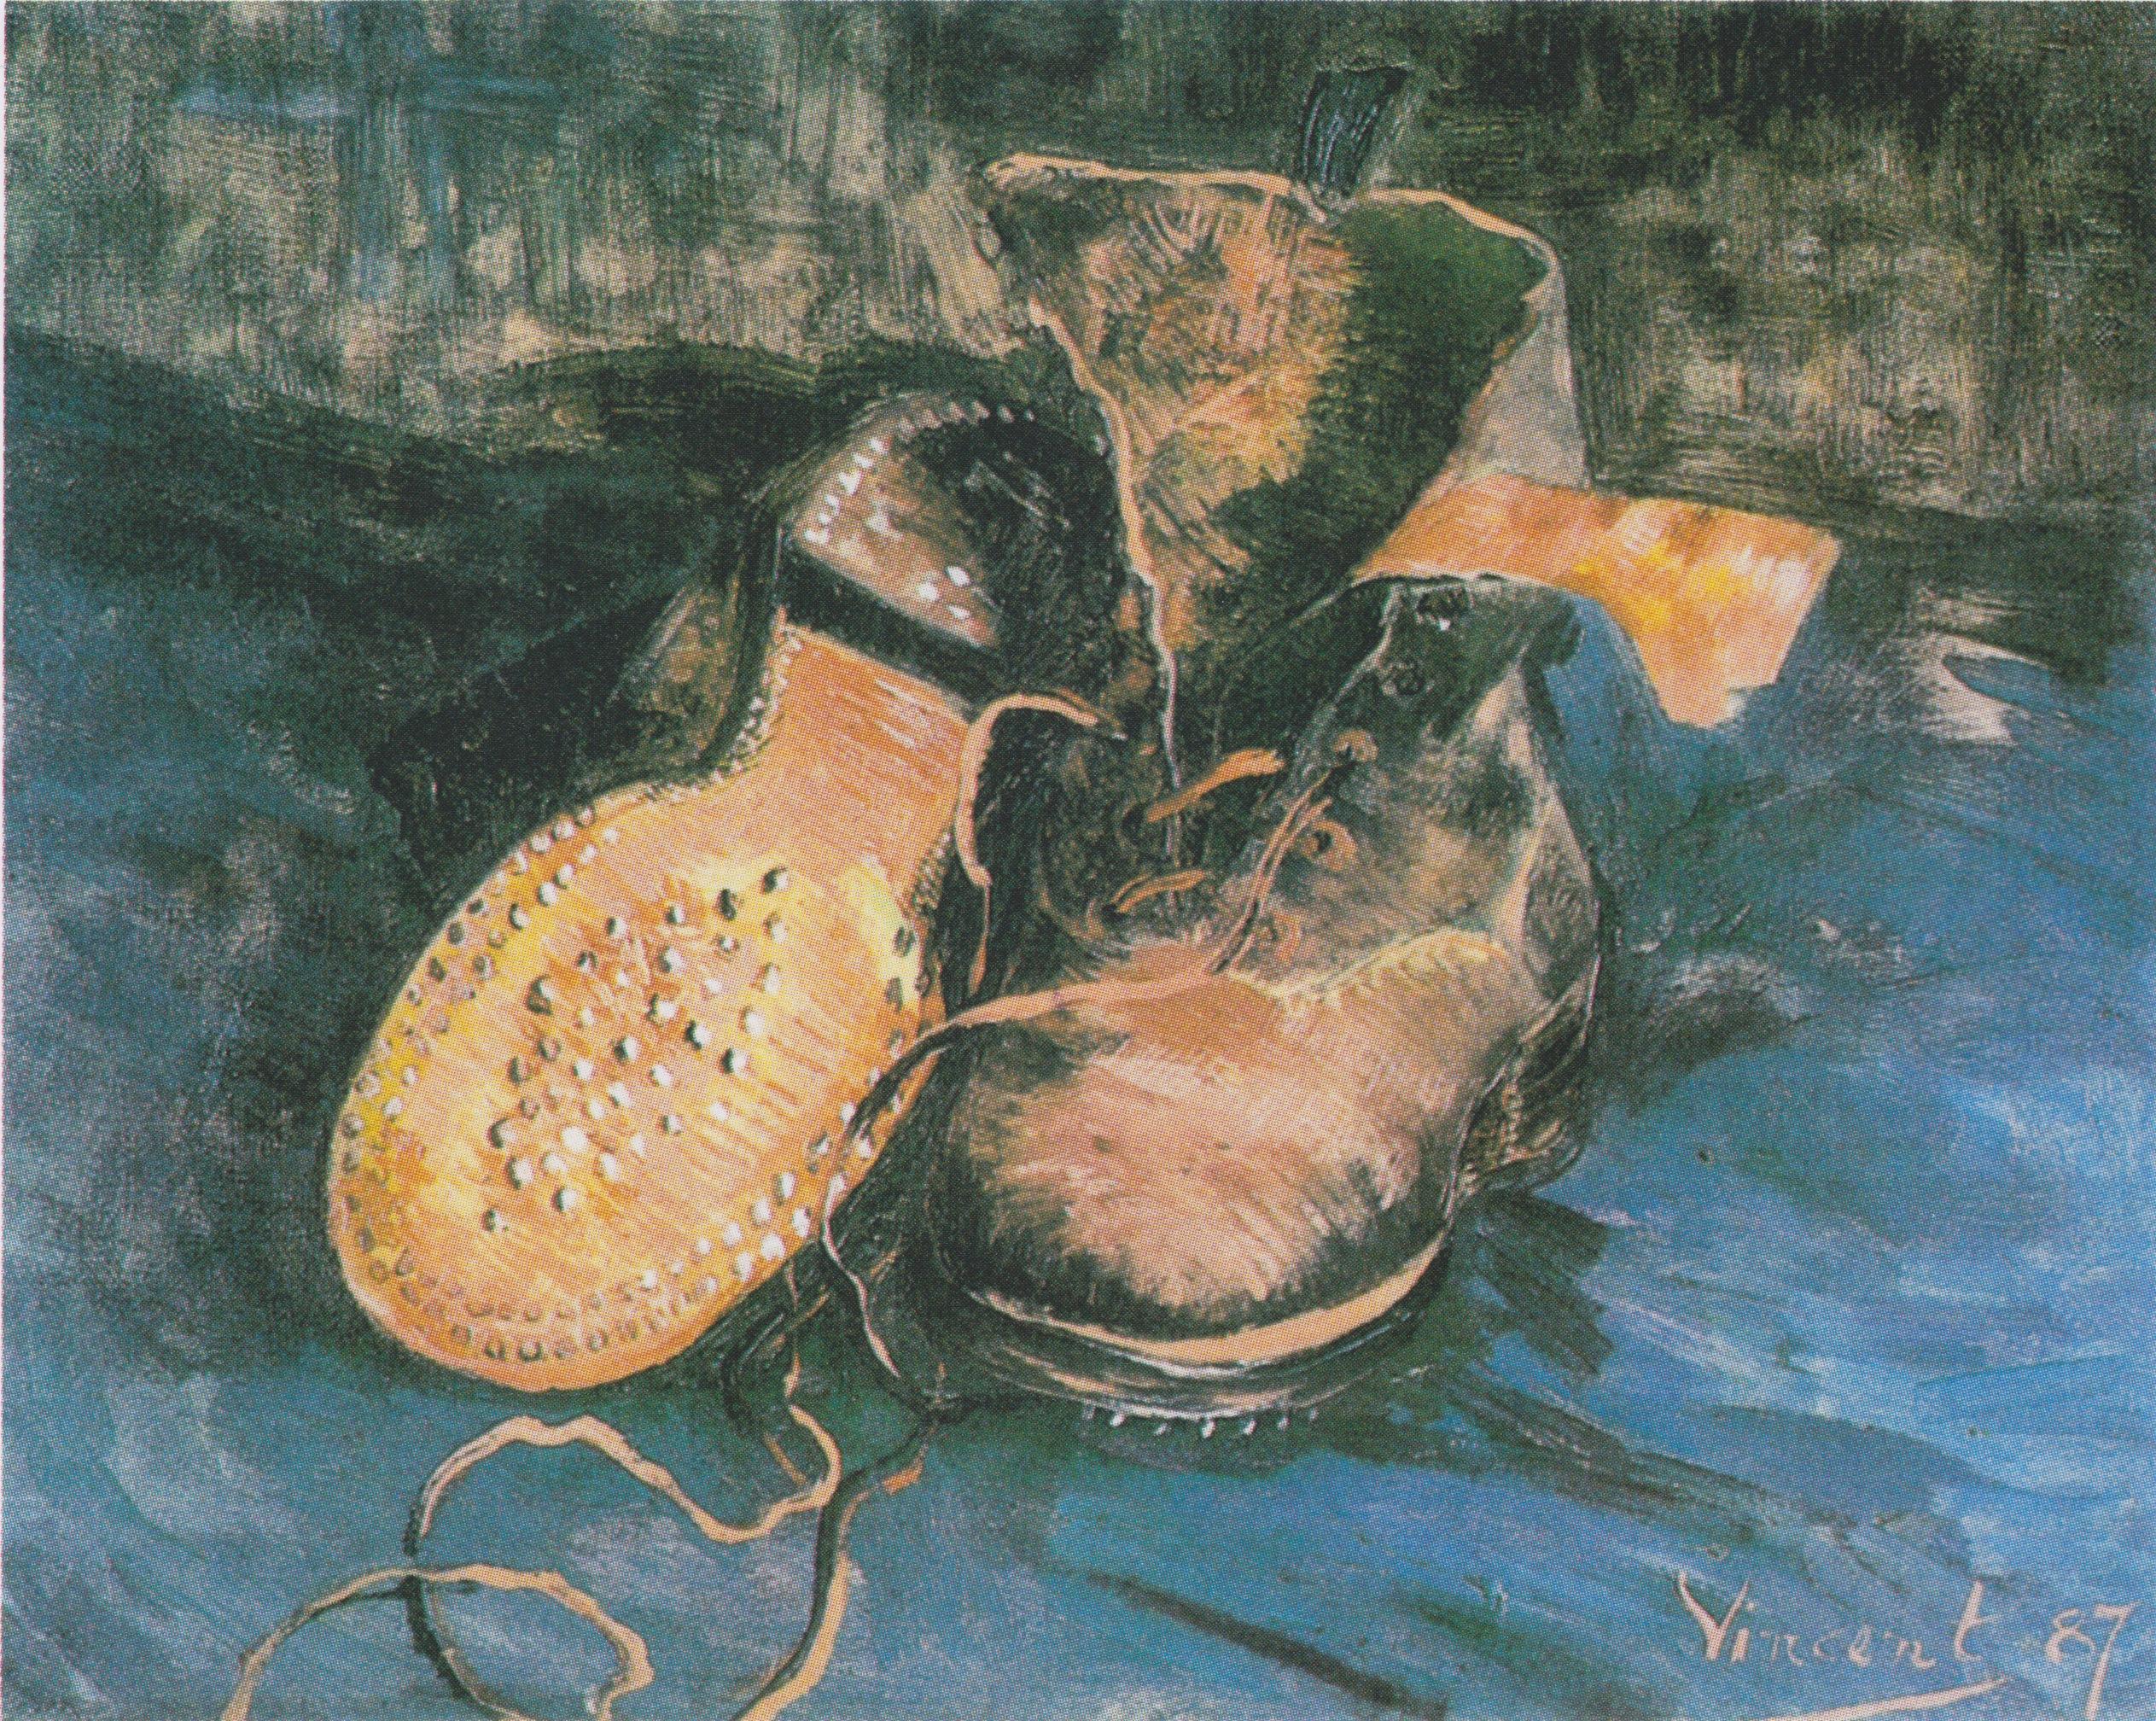 Wikipedia Paar Gogh Ein Schuhe1 – Datei van jpeg doBCex